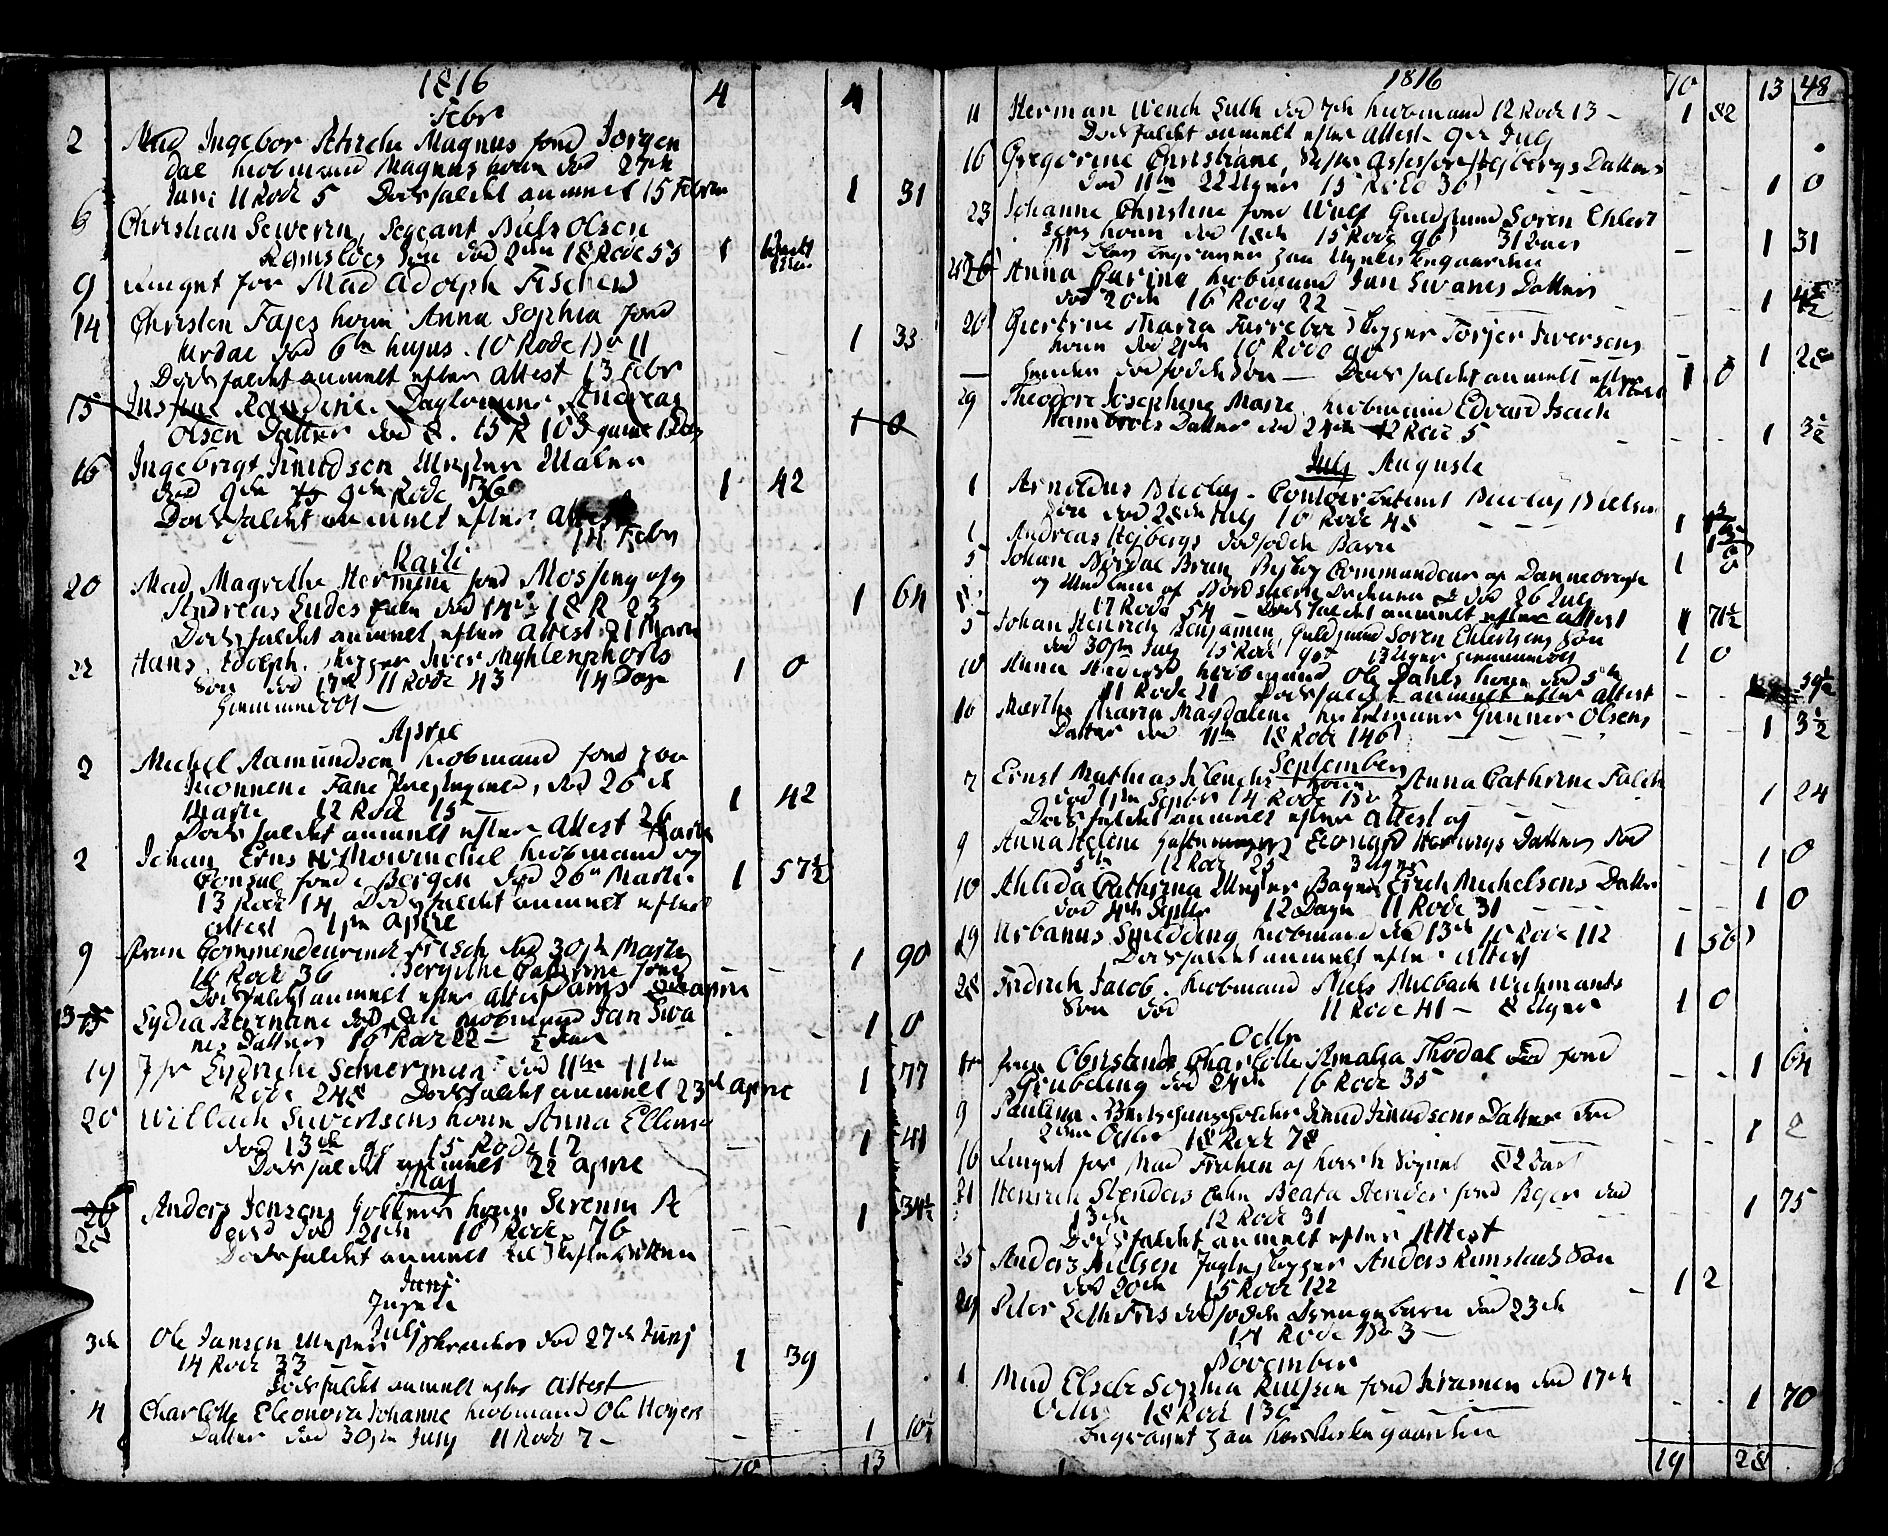 SAB, Domkirken Sokneprestembete, H/Haa/L0009: Ministerialbok nr. A 9, 1776-1821, s. 48